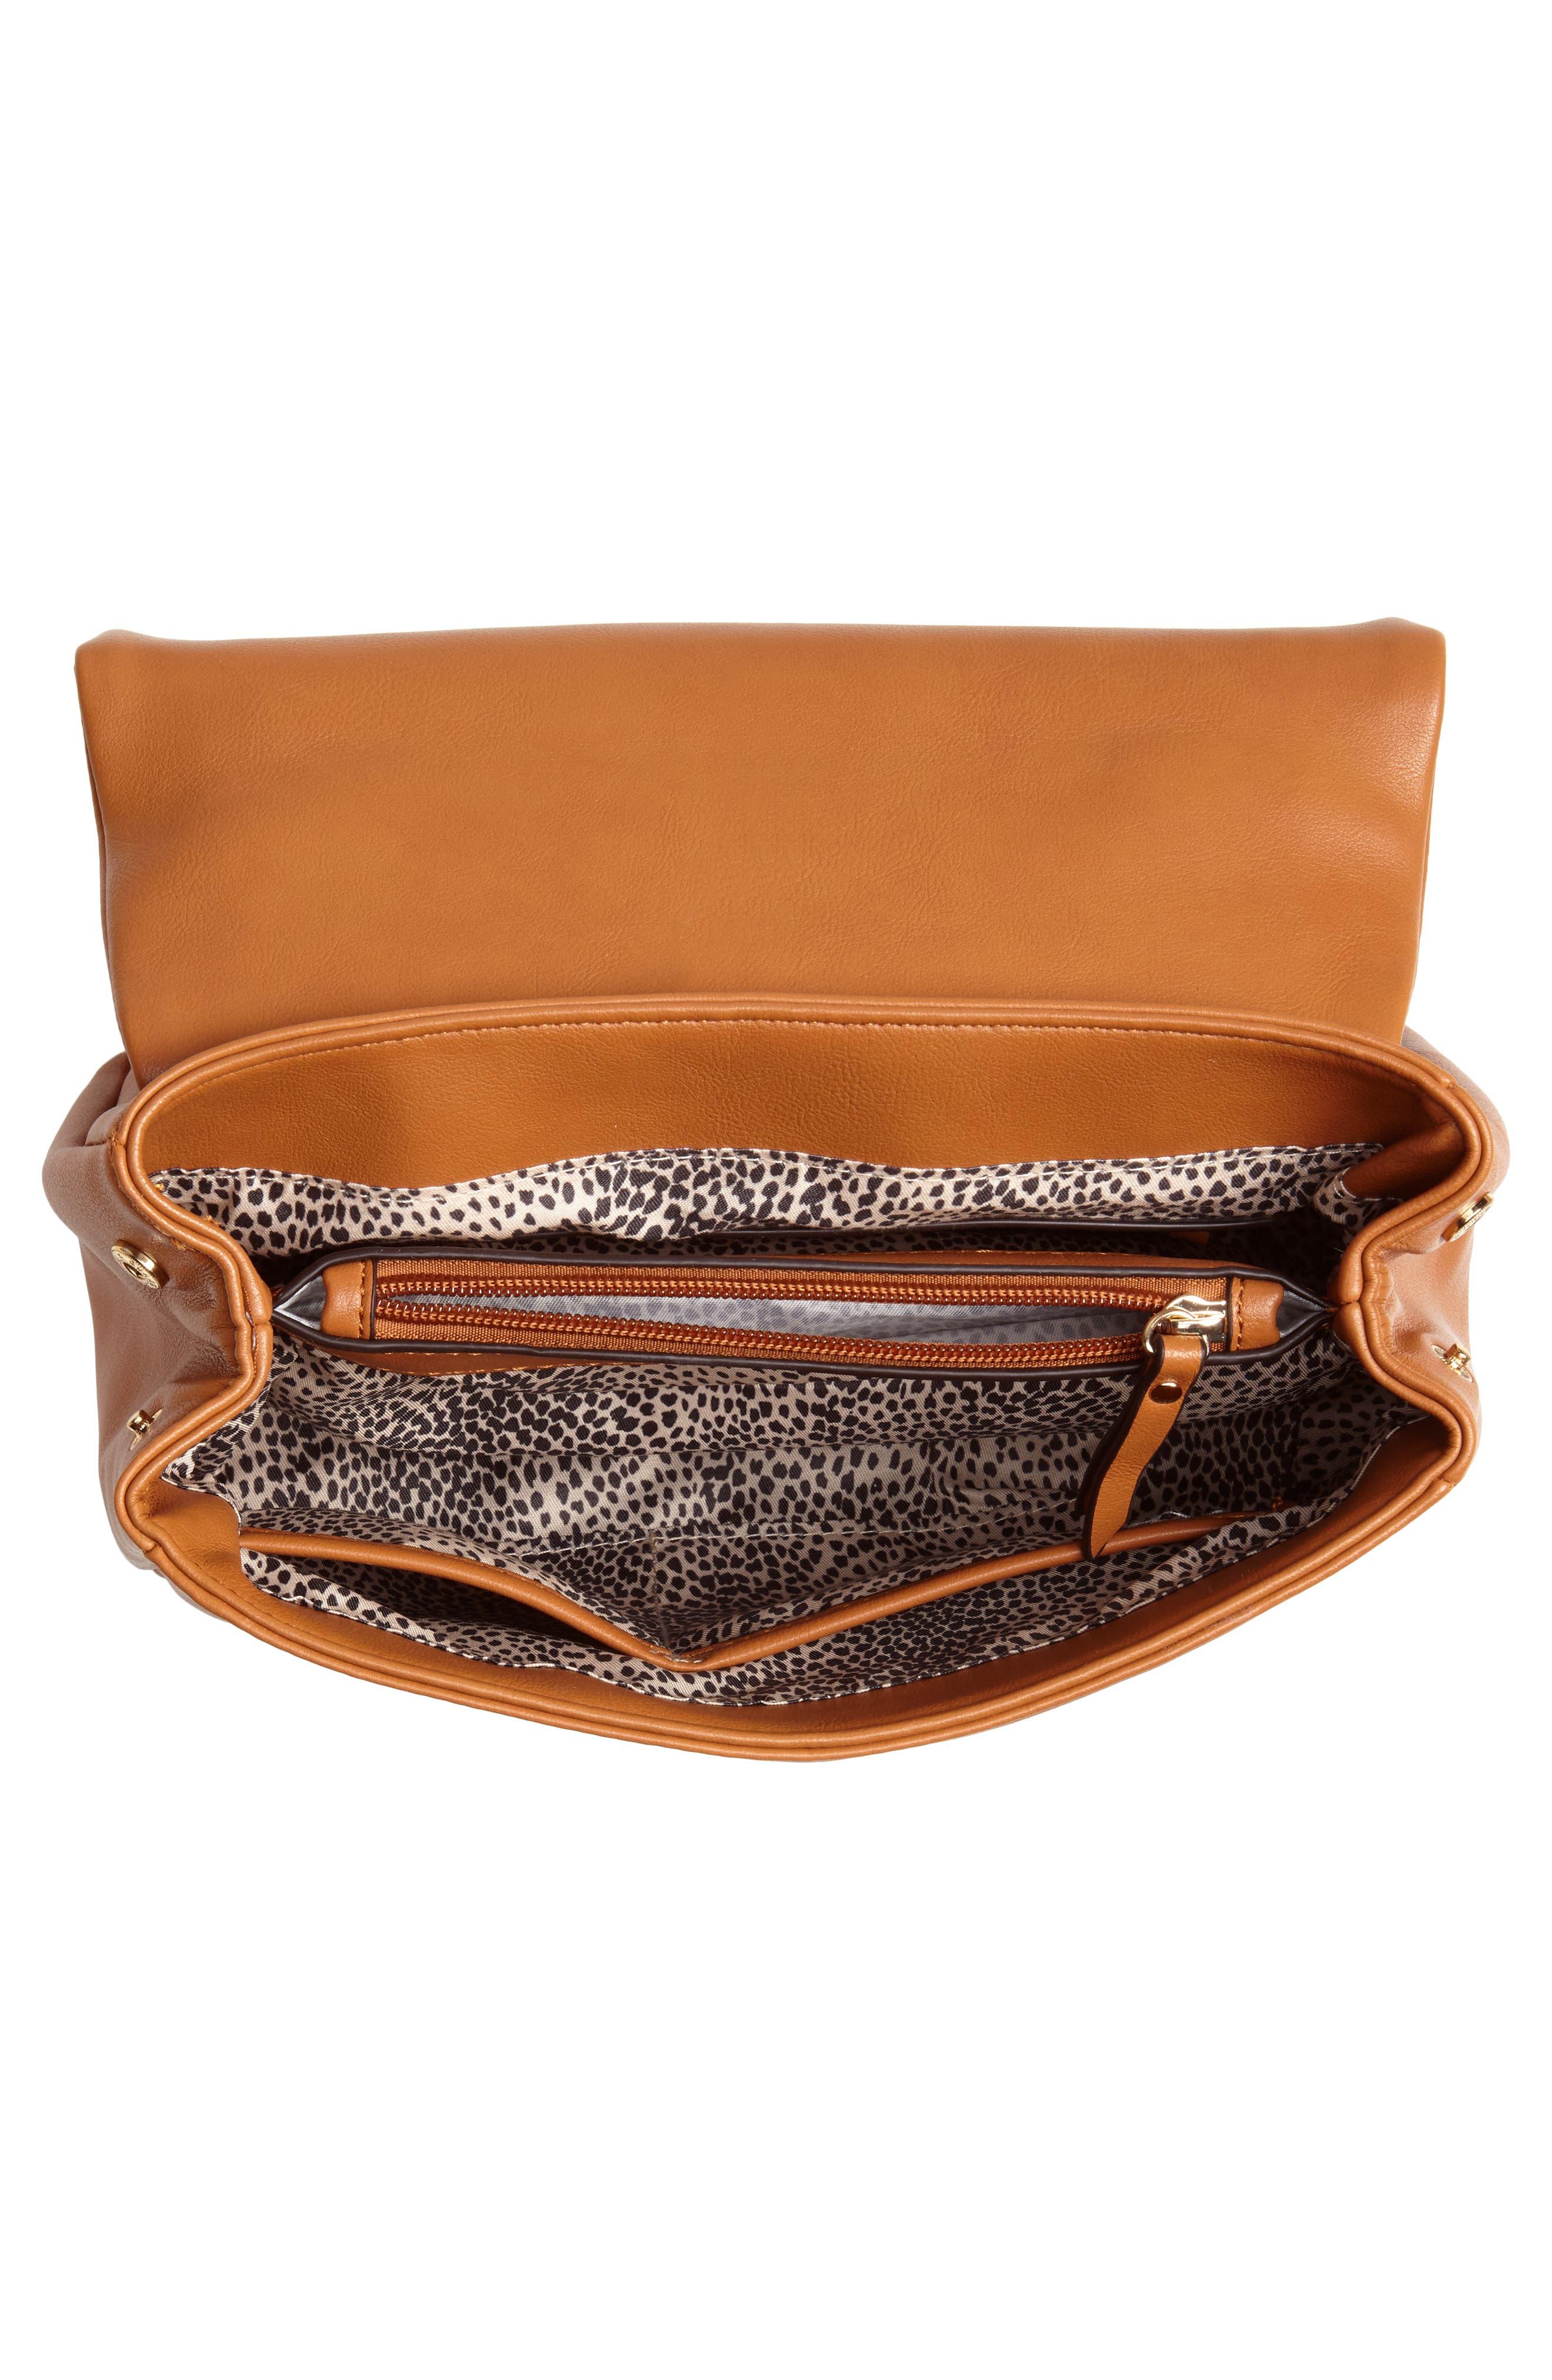 SOLE SOCIETY, Rubie Faux Leather Crossbody Bag, Alternate thumbnail 5, color, COGNAC